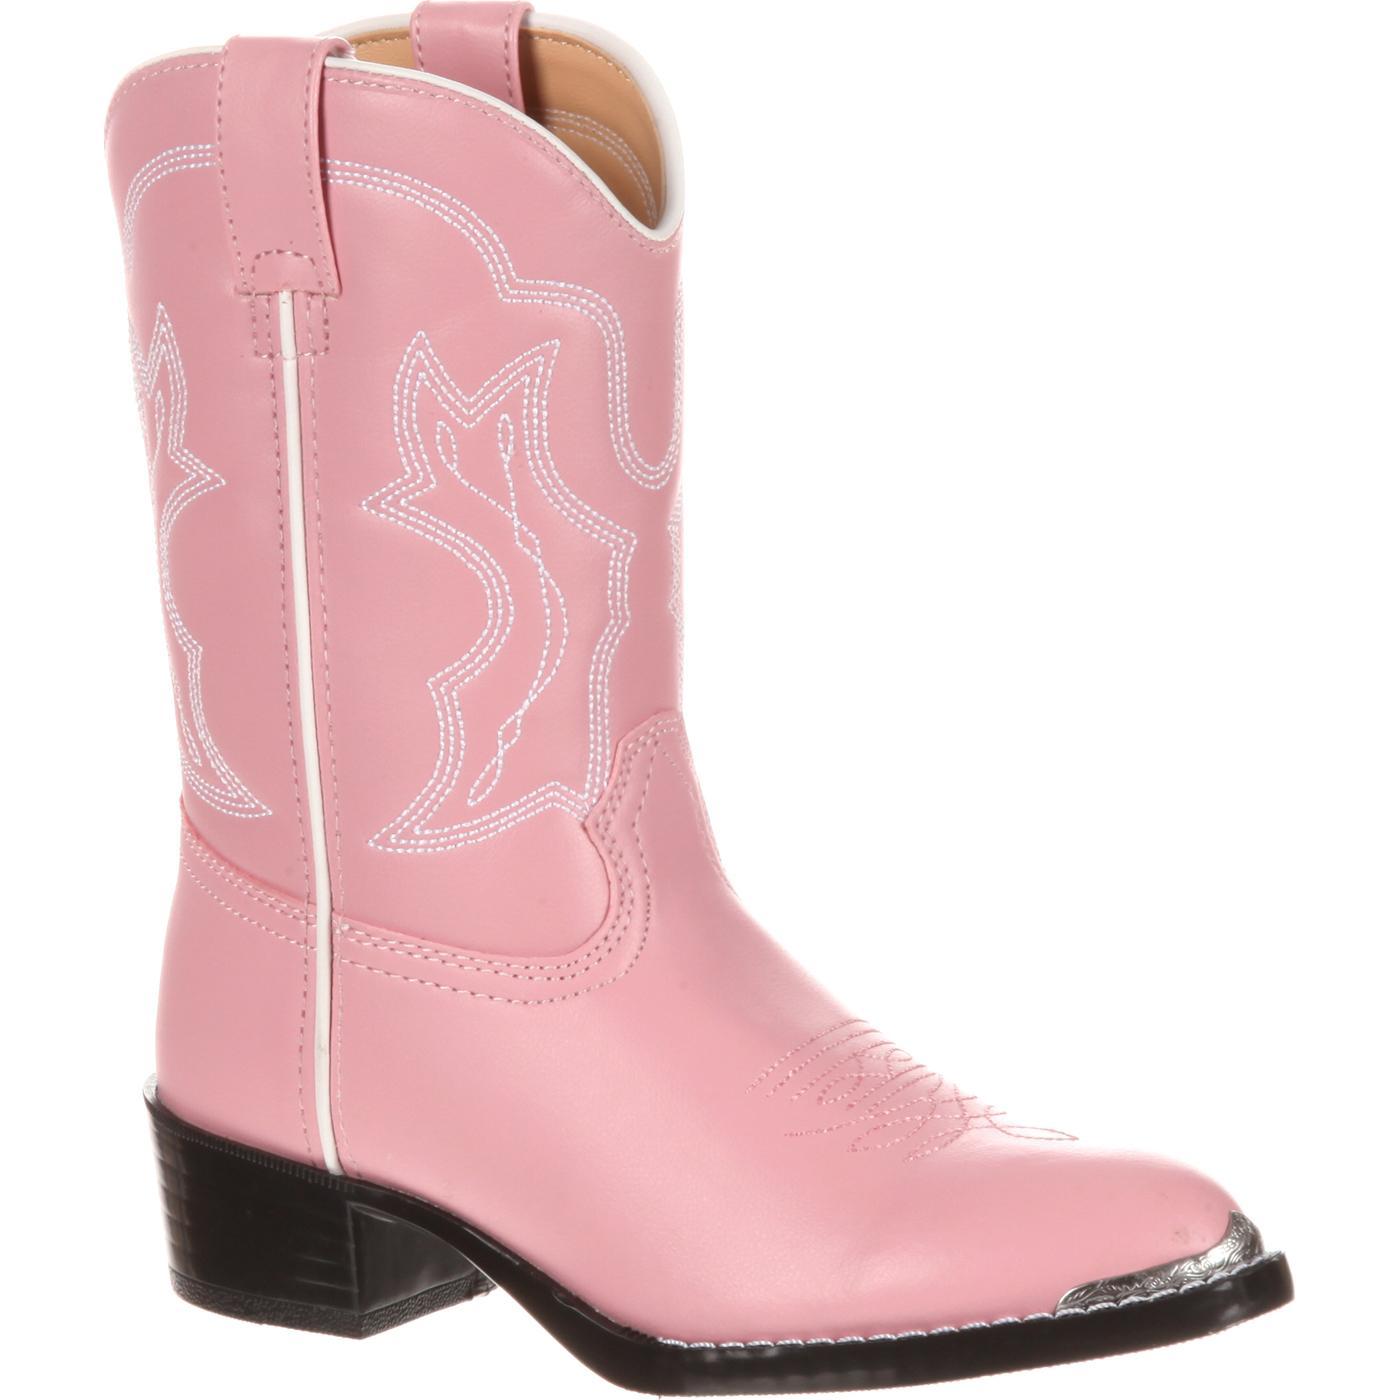 nuevo concepto 8d2a7 b9f4d Bota vaquera rosada para niñas Durango